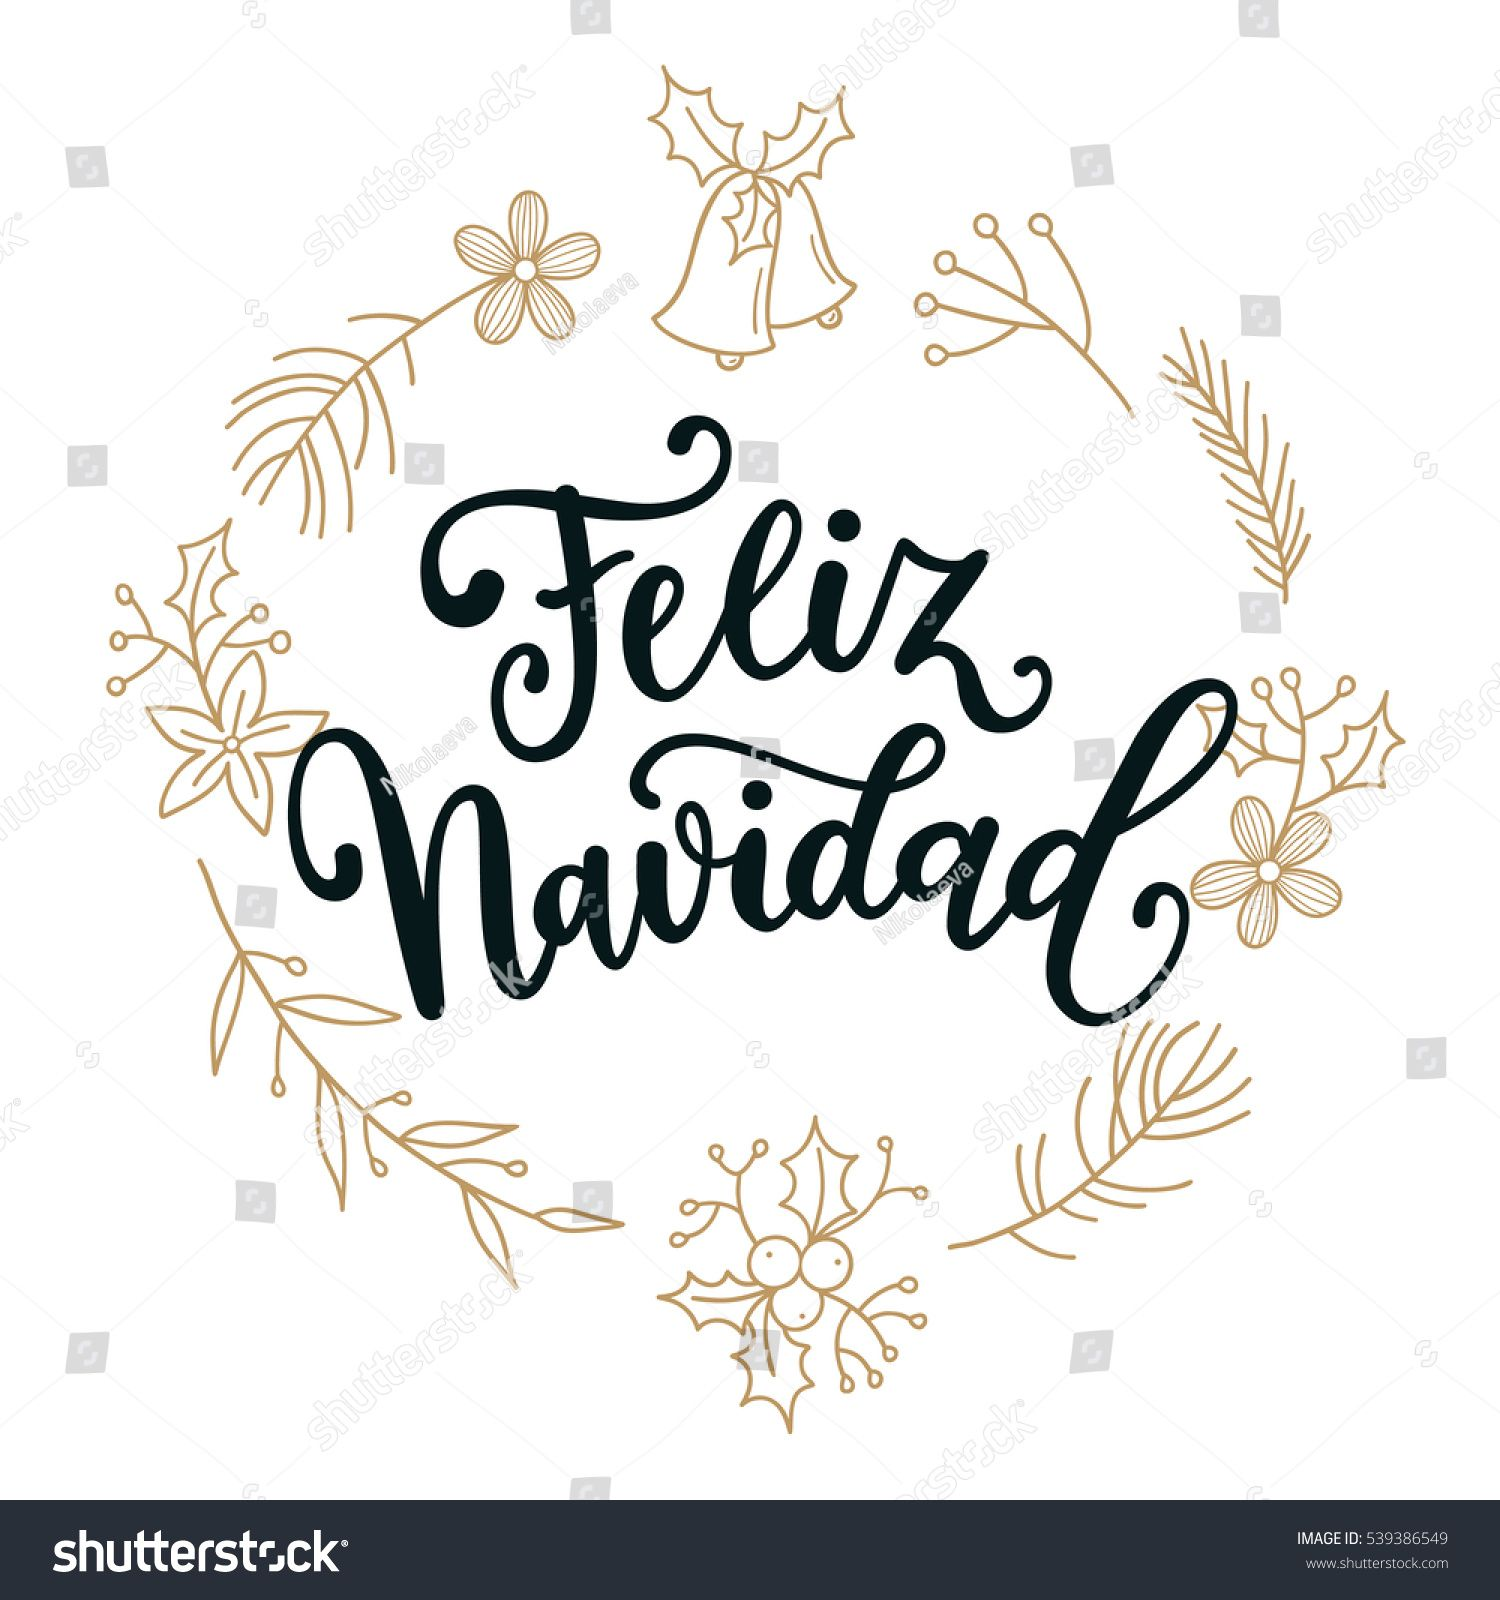 Feliz Navidad Holidays Greeting Card With Spanish Phrase Means